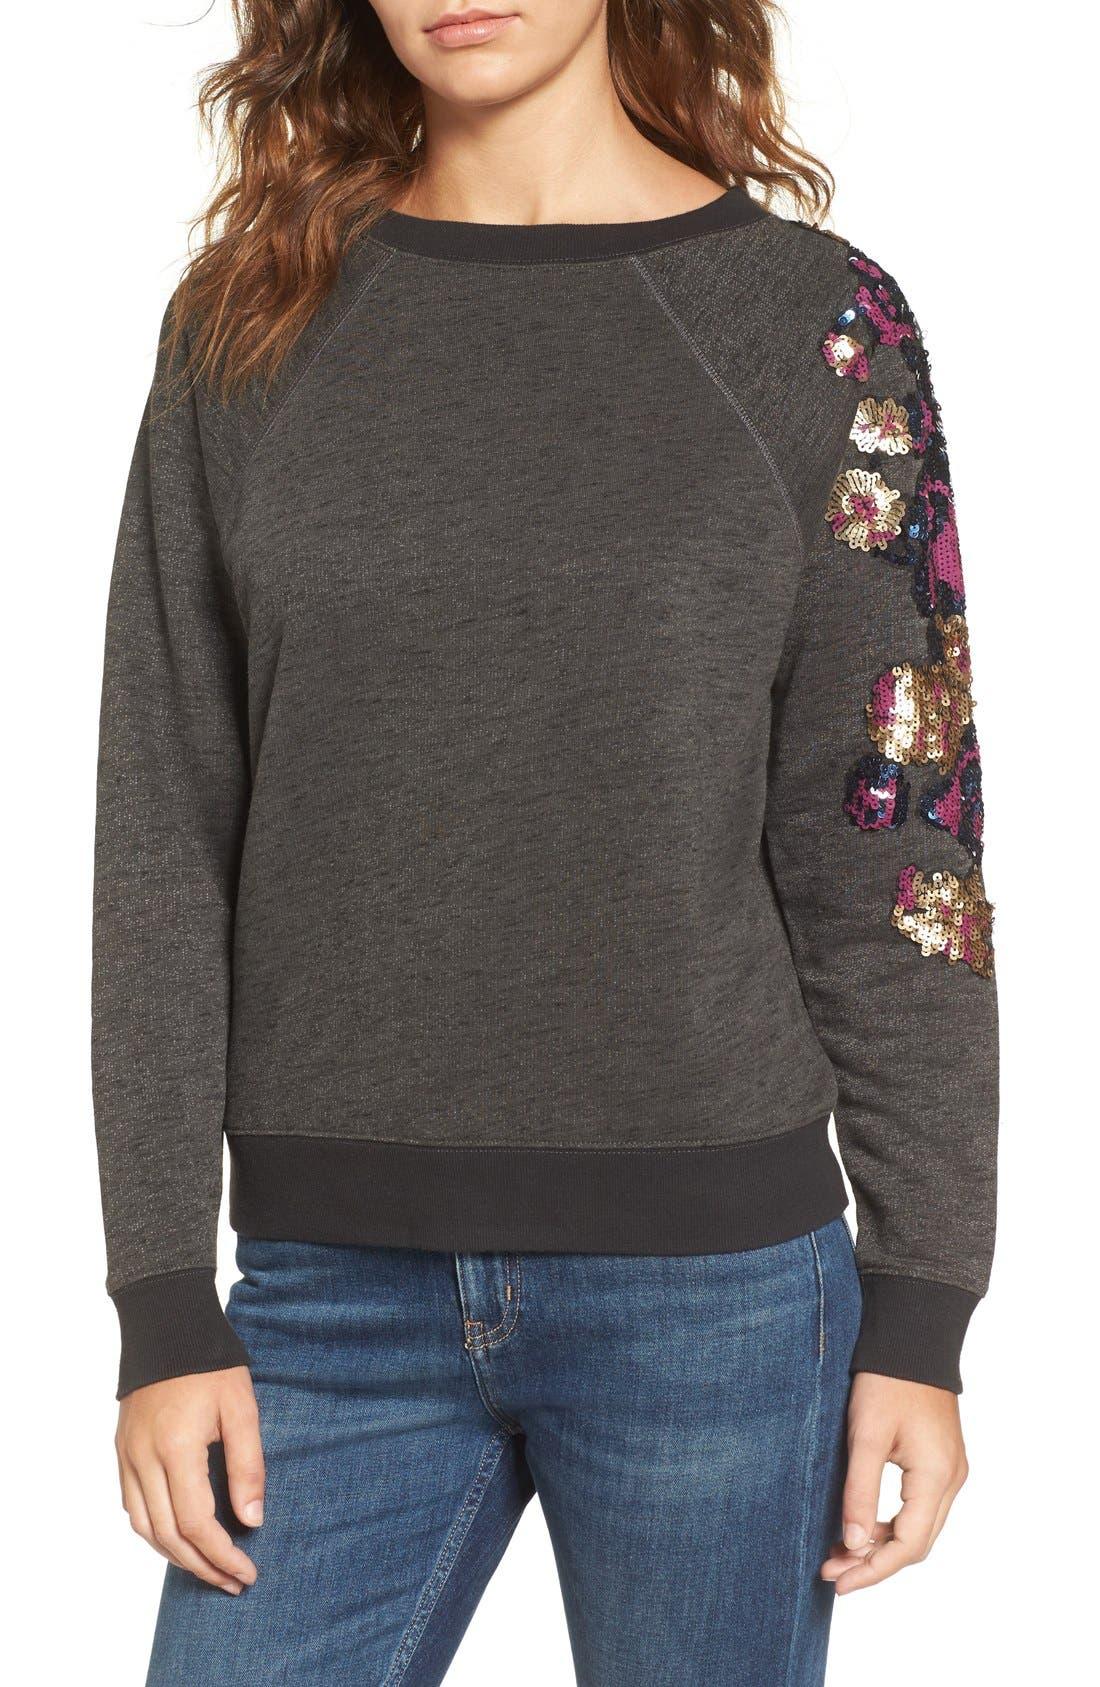 Main Image - Rebecca Minkoff Sequin Sweatshirt